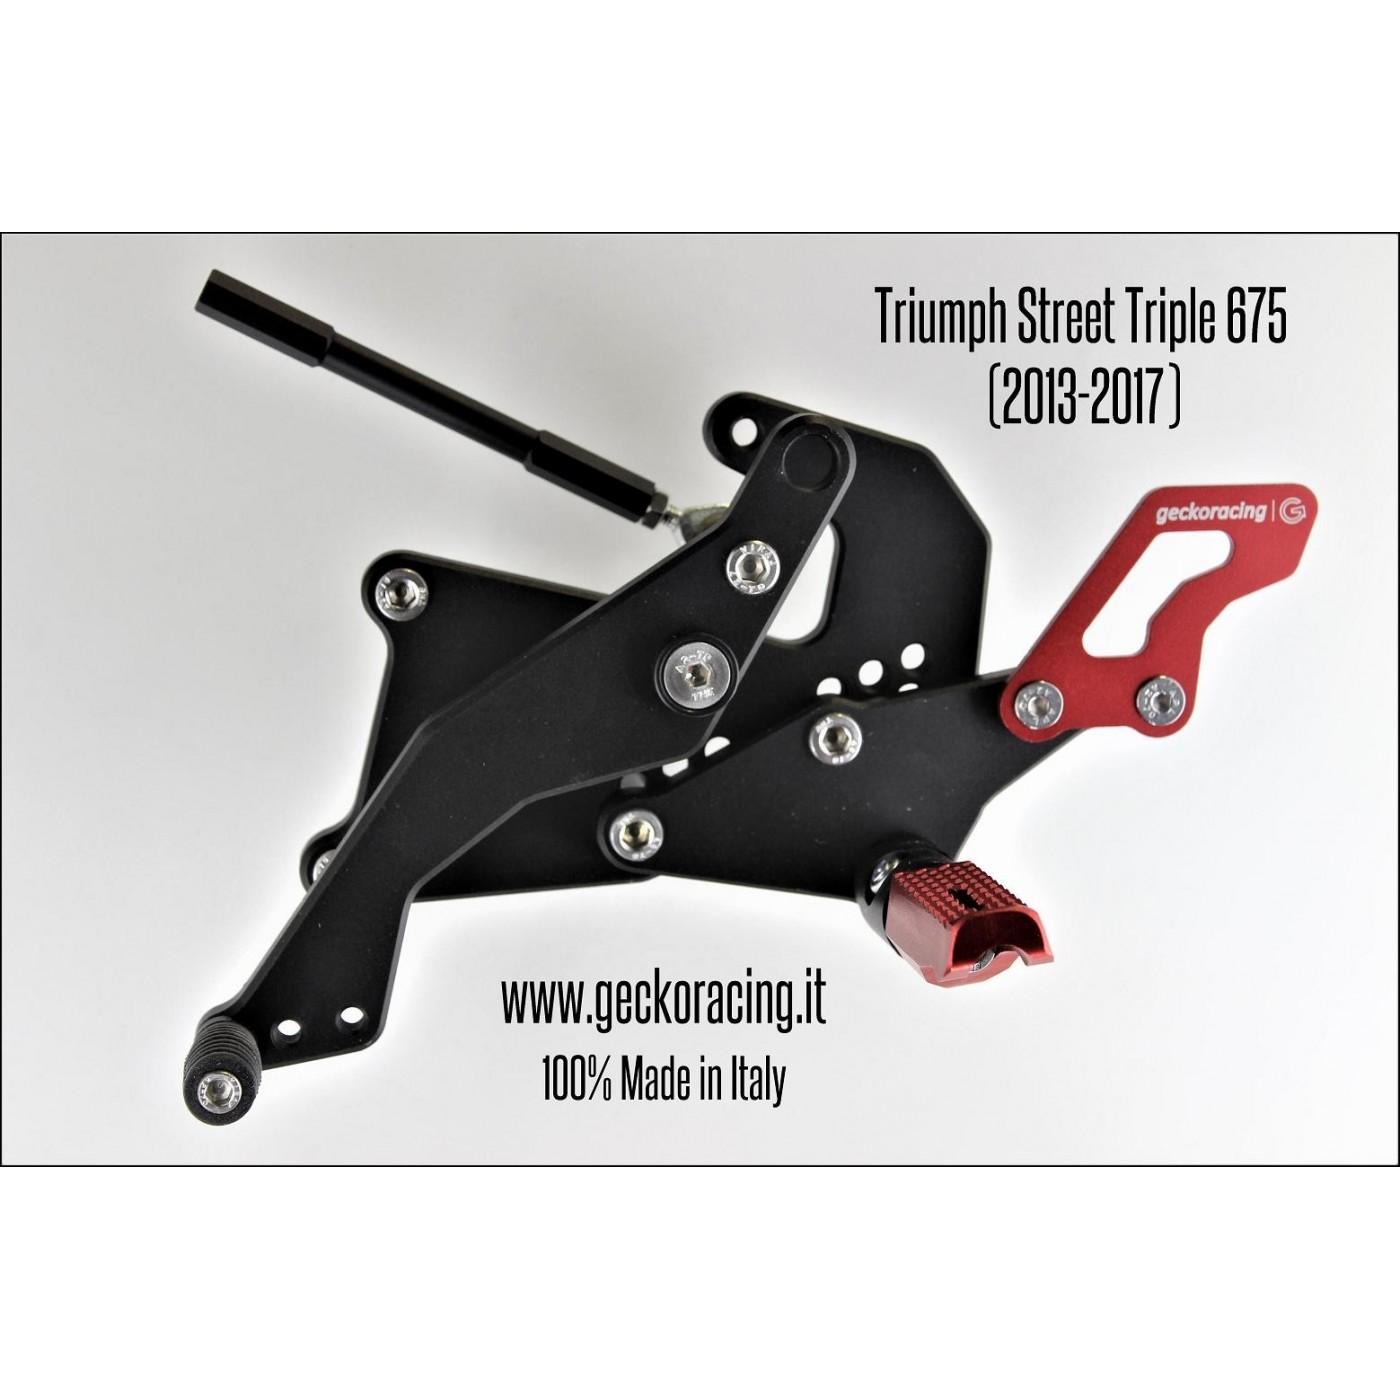 Pedane arretrate regolabili Triumph Street Triple 675 Cambio